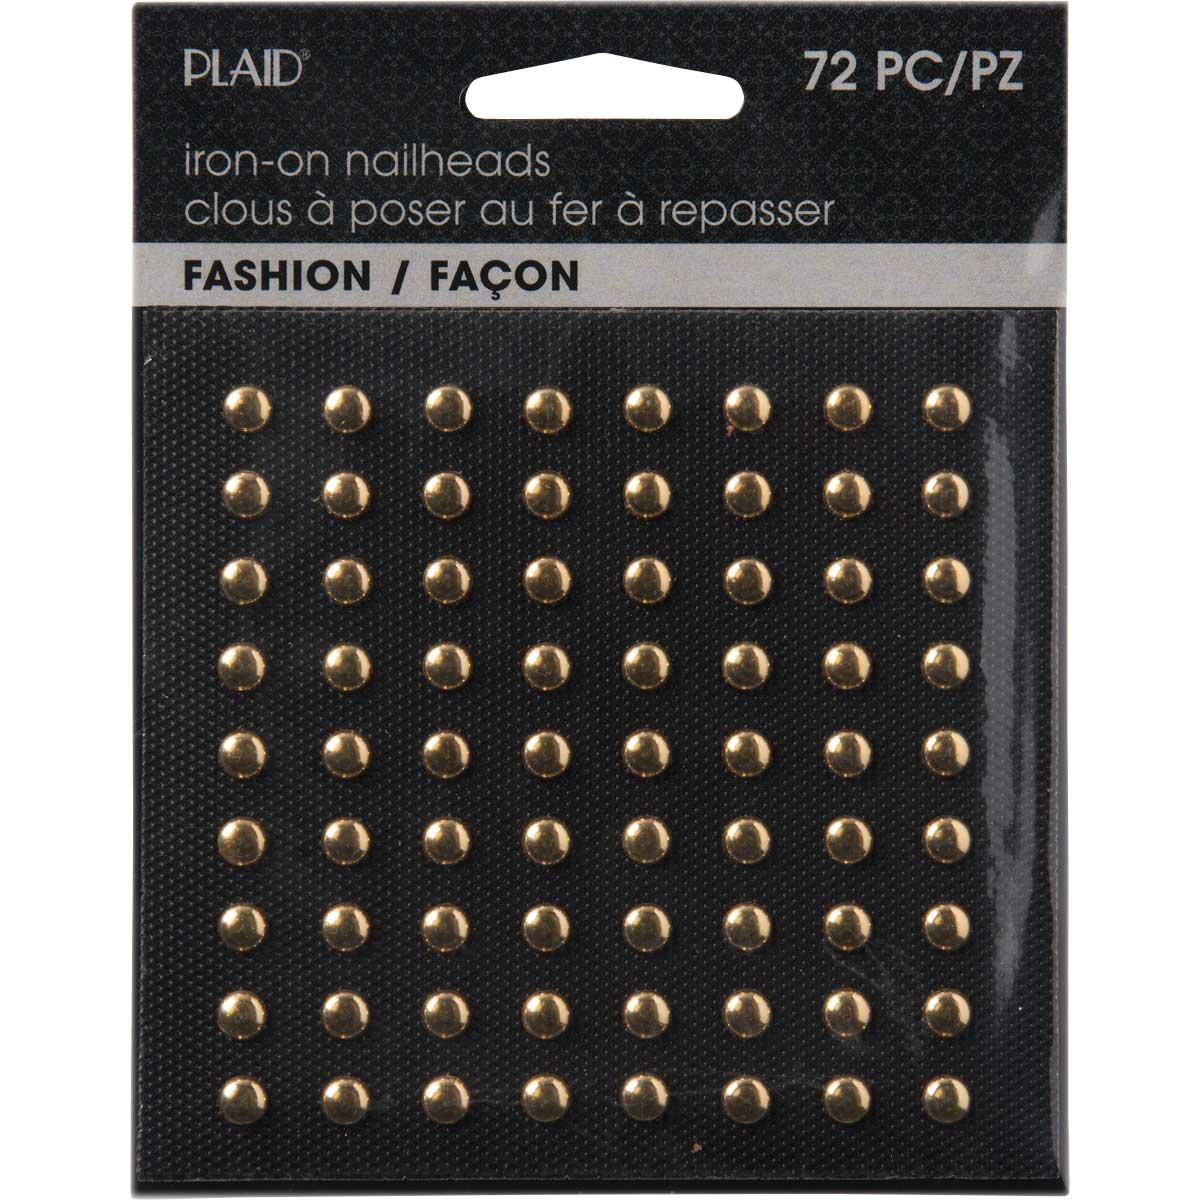 Plaid ® Hot Fix Nailhead Iron-Ons - Round Shiny Gold